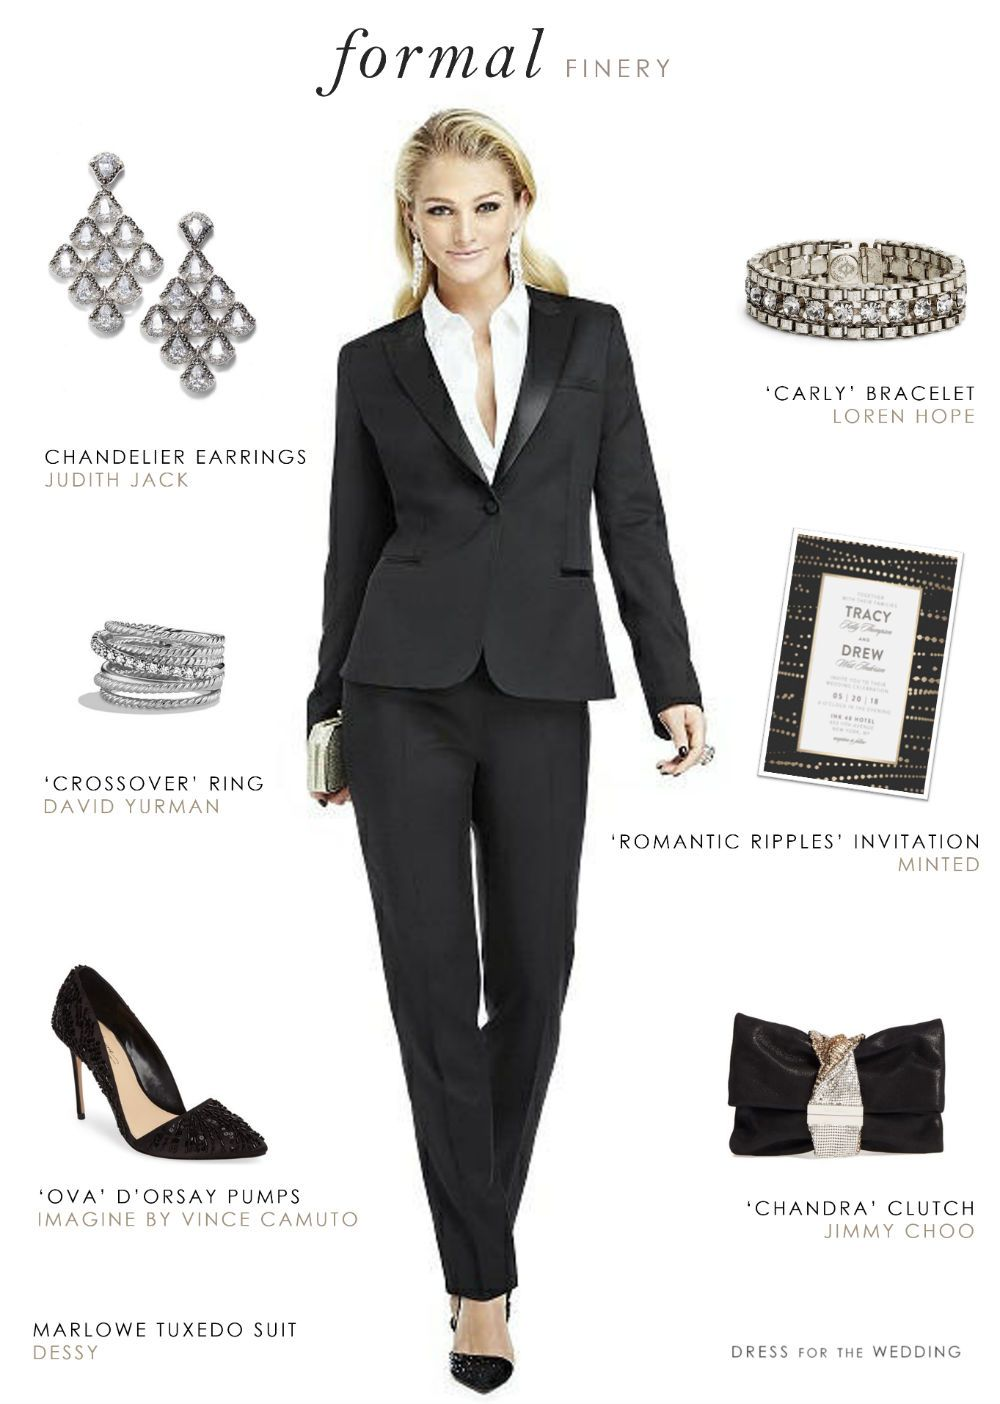 A Style Idea For Women S Tuxedo Wedding Or Black Tie Event This Feminine